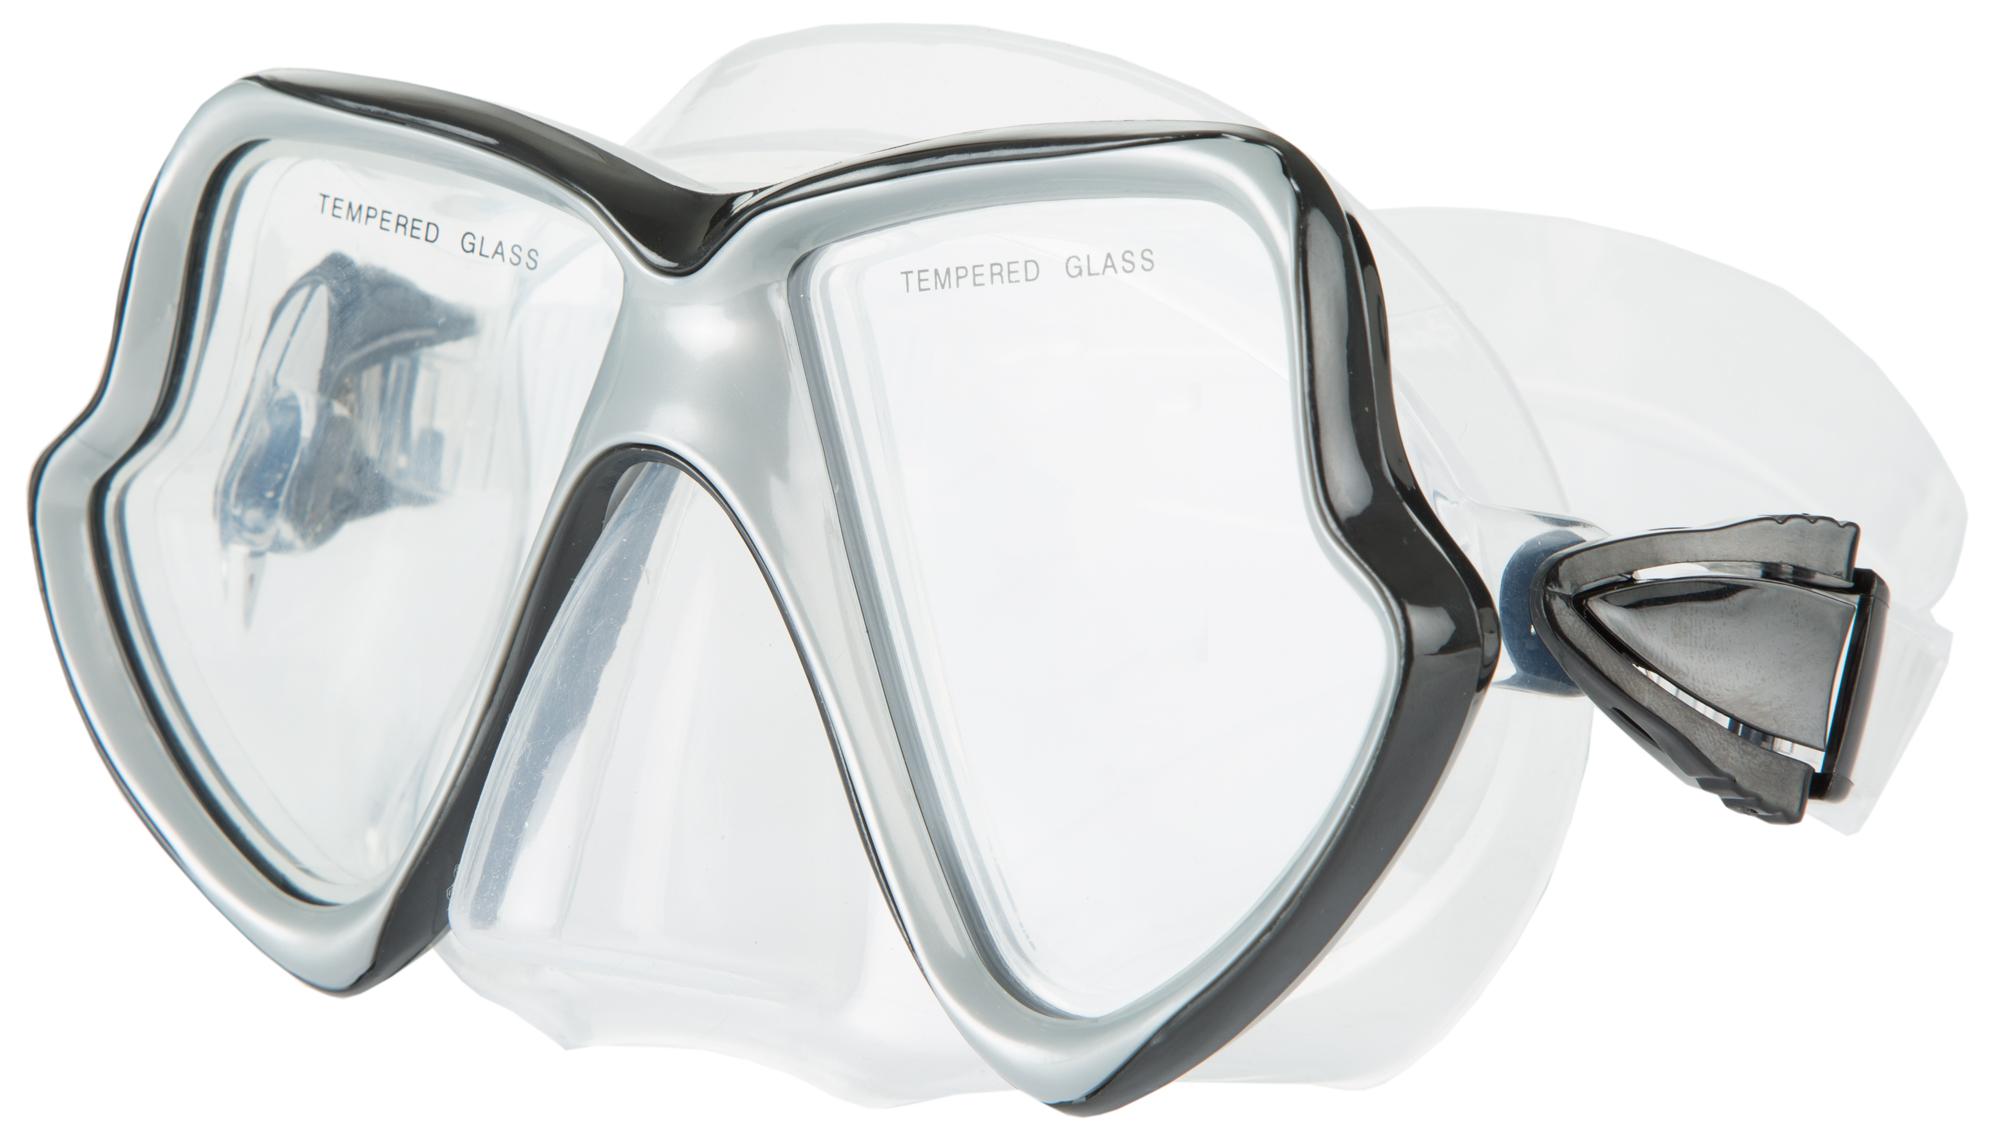 Joss Маска для плавания Joss купить маску и трубку для подводного плавания